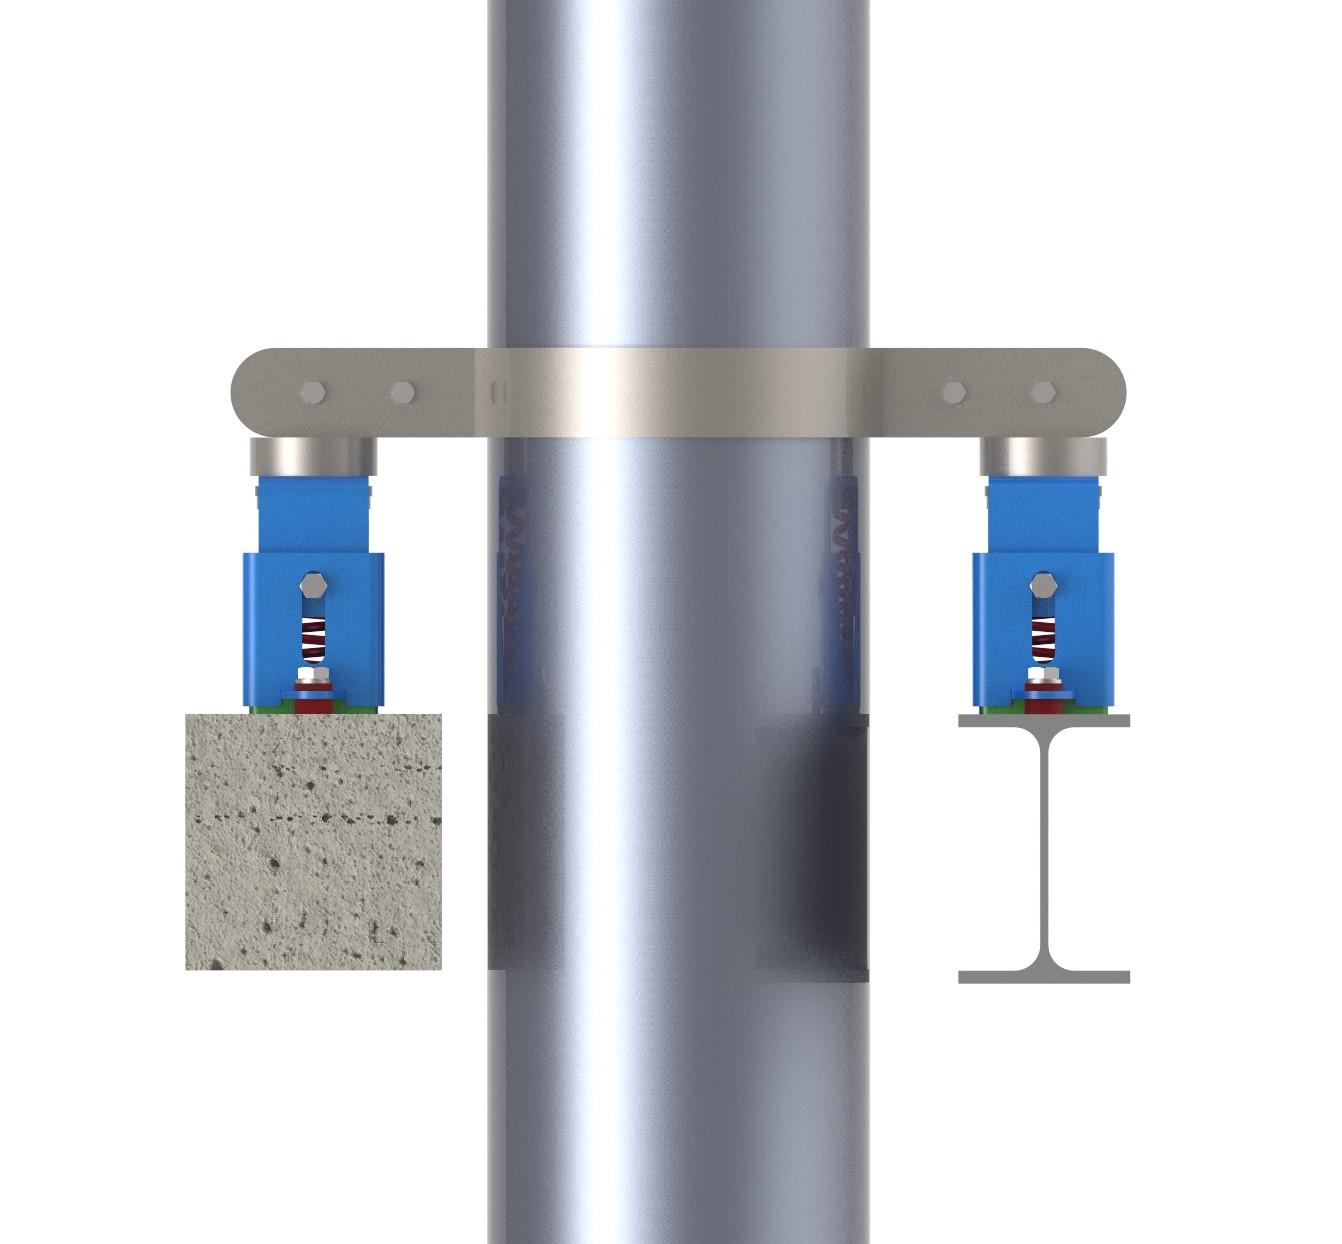 pipe-riser-insulation-03.jpg